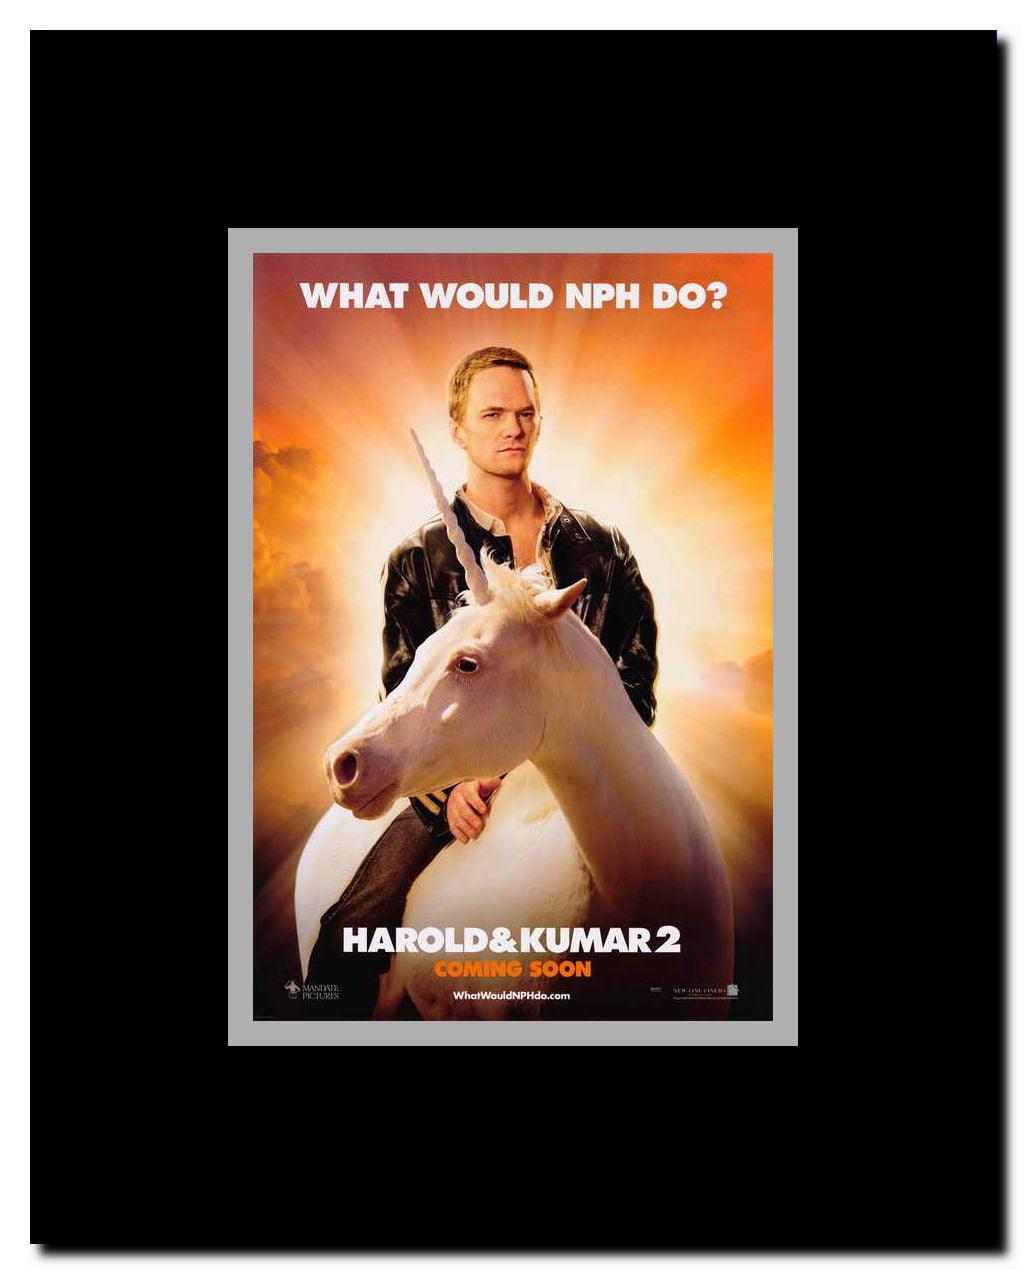 Harold And Kumar Escape From Guantanamo Bay Full Movie Free harold and kumar: escape from guantanamo bay framed movie poster -  walmart